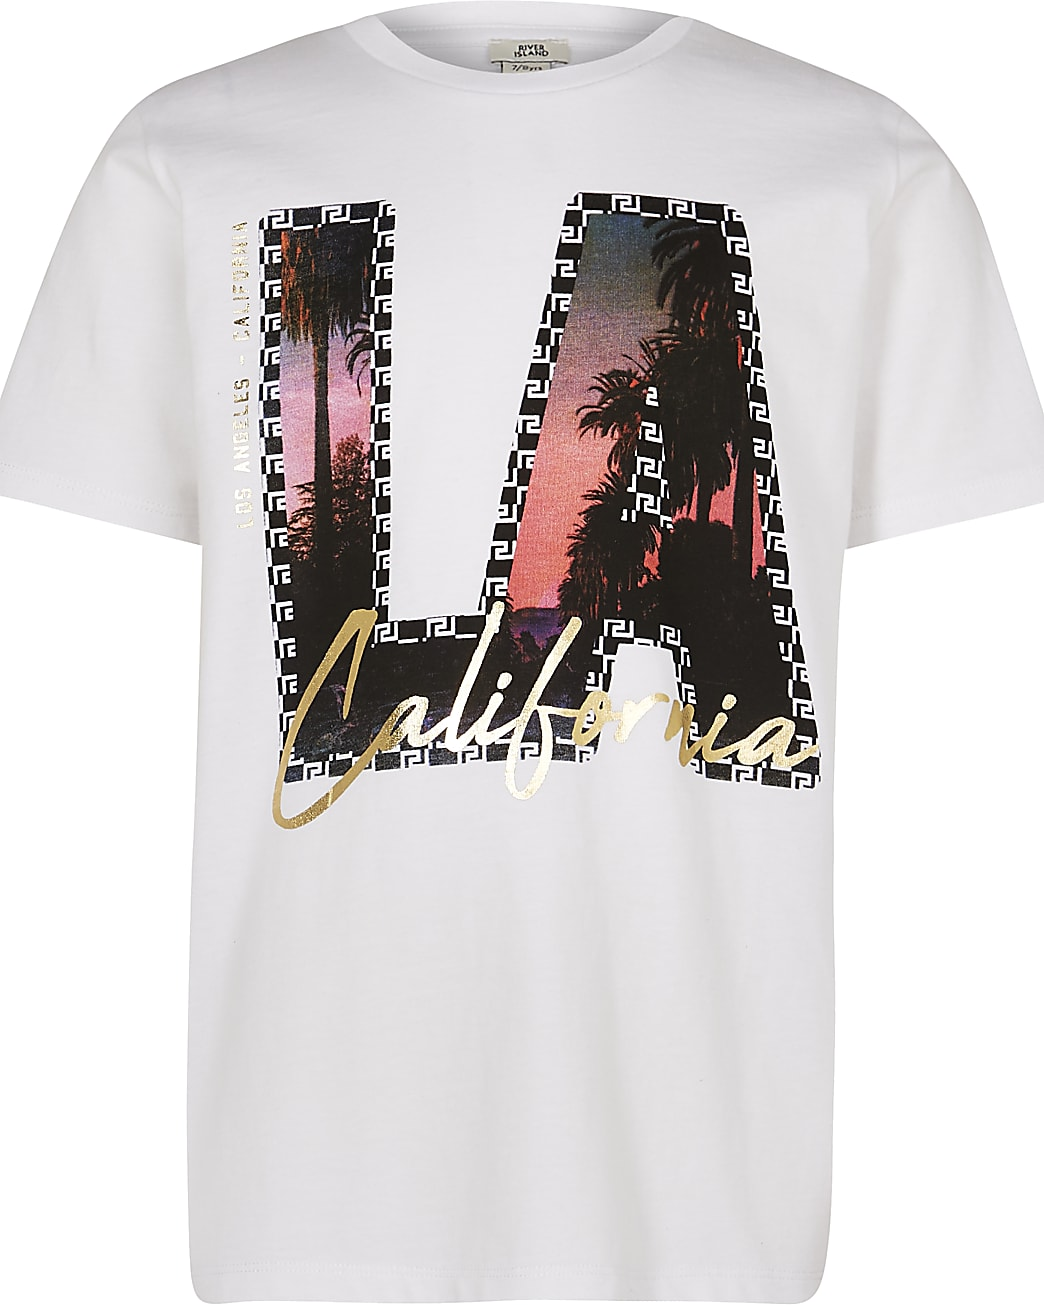 Boys white 'LA California' graphic t-shirt